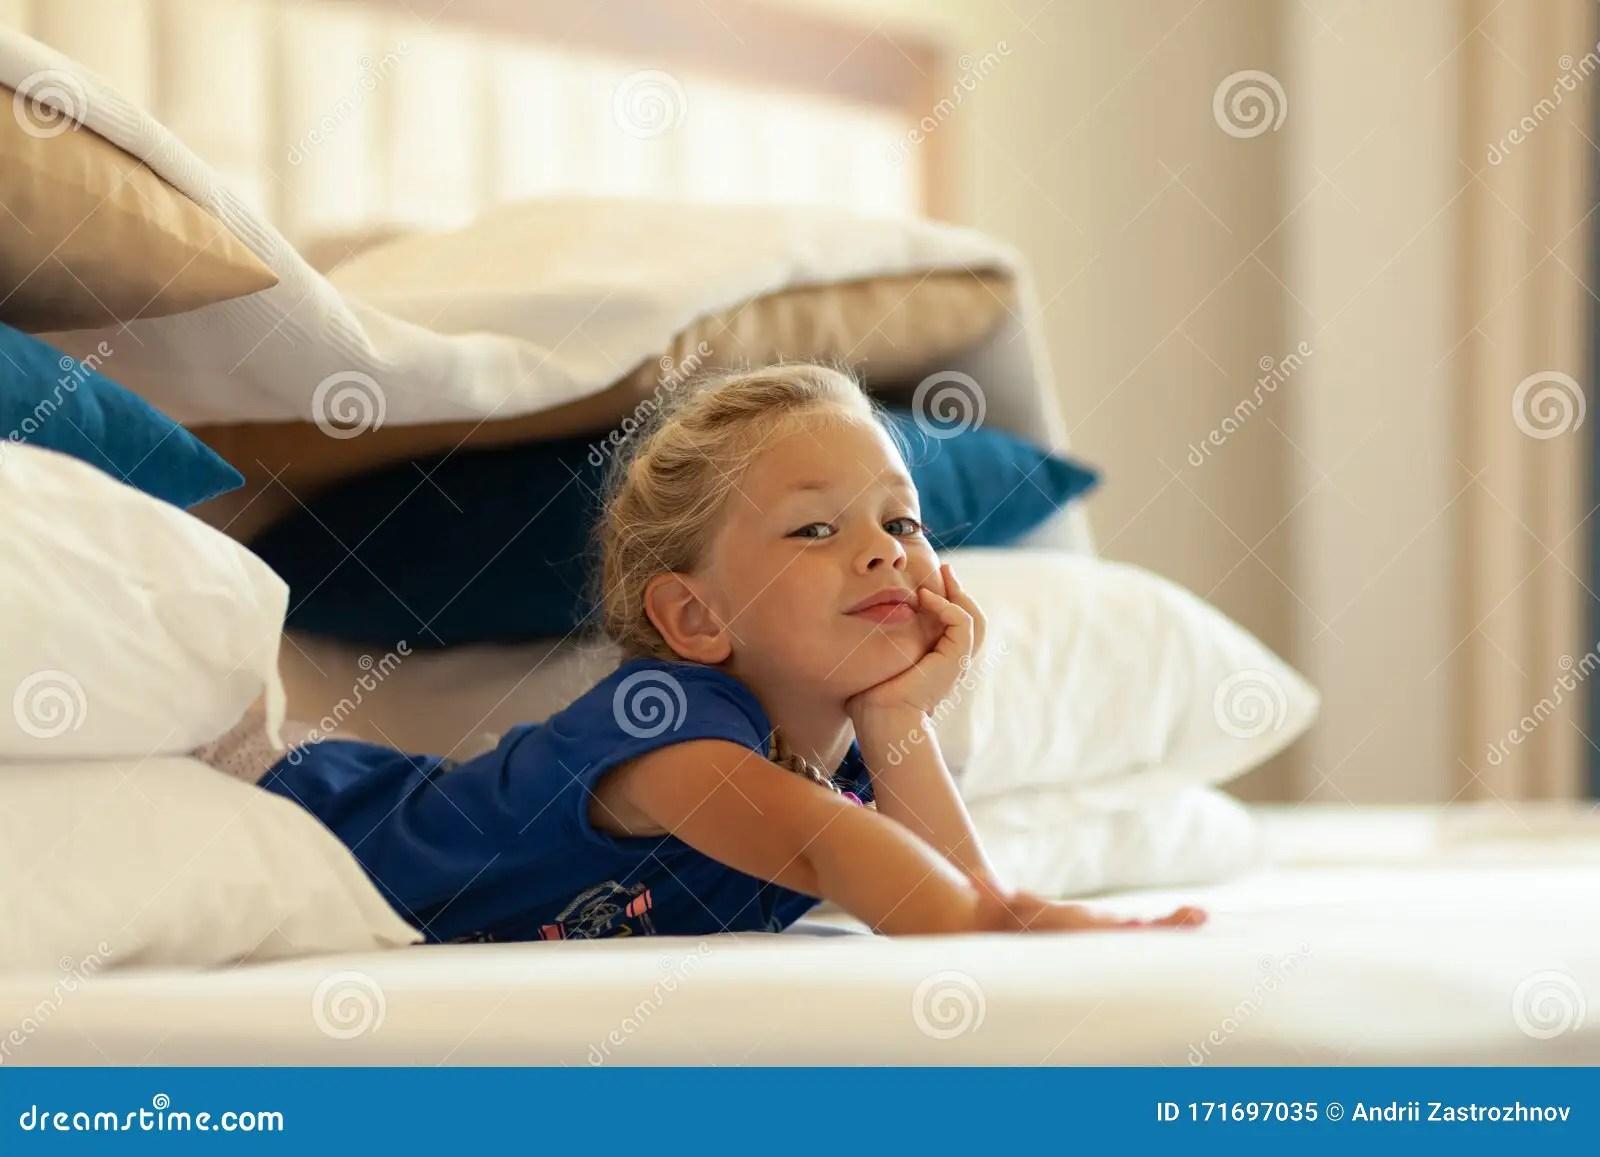 https www dreamstime com little cute girl built impromptu fort castle house out pillows blankets bed children handmade tent lodge little cute image171697035